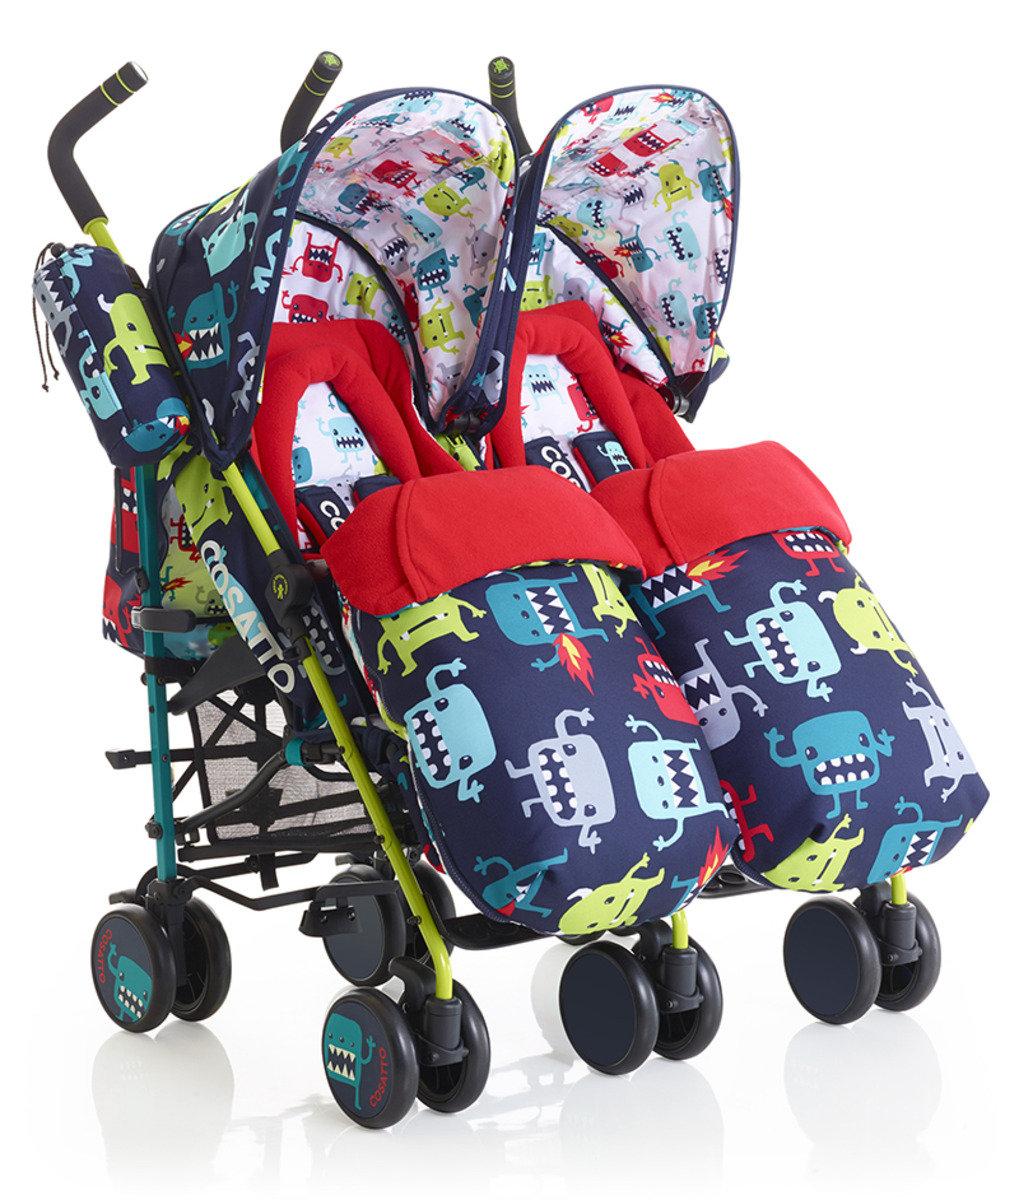 英國 Cosatto Supa Dupa 嬰兒雙人推車 - Cuddle Monster 2